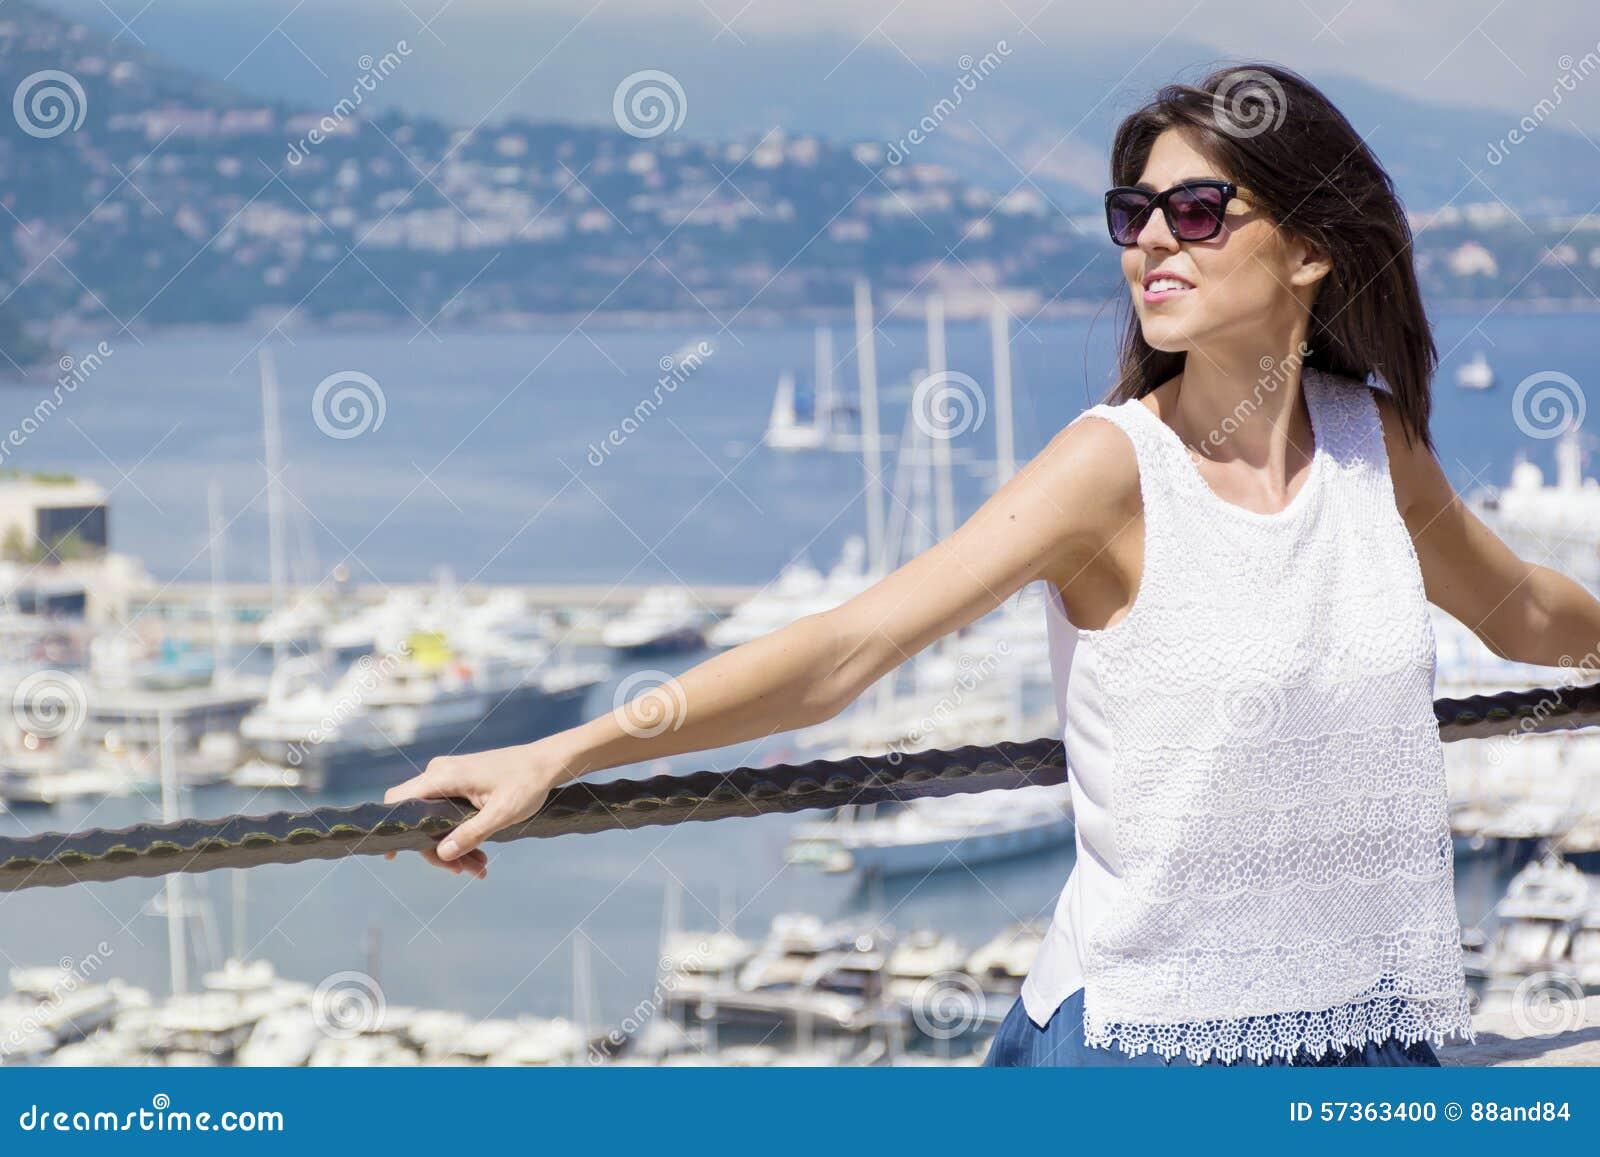 Beautiful woman looking at Monte Carlo harbour in Monaco. Azur coast.